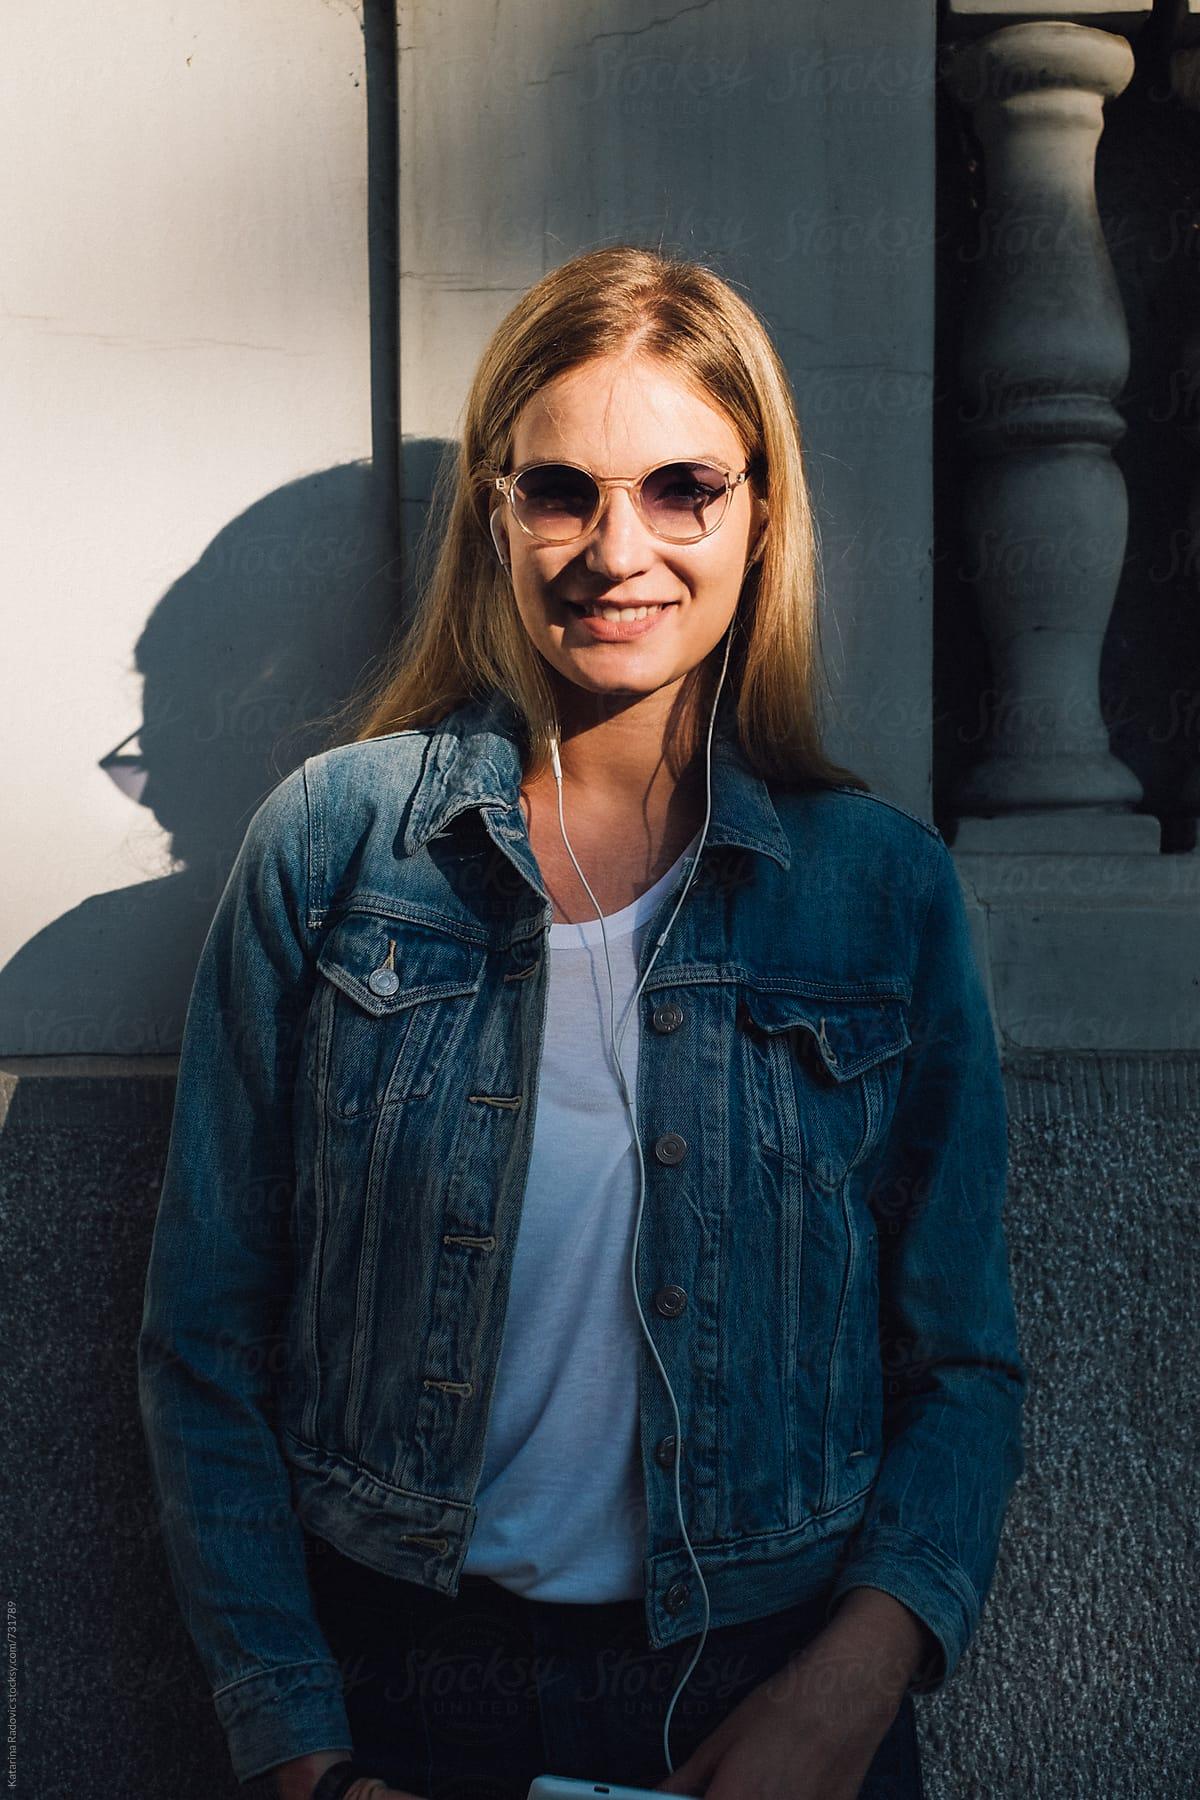 ed94653fa0 Portrait Of A Beautiful Blonde Woman Wearing Denim Jacket